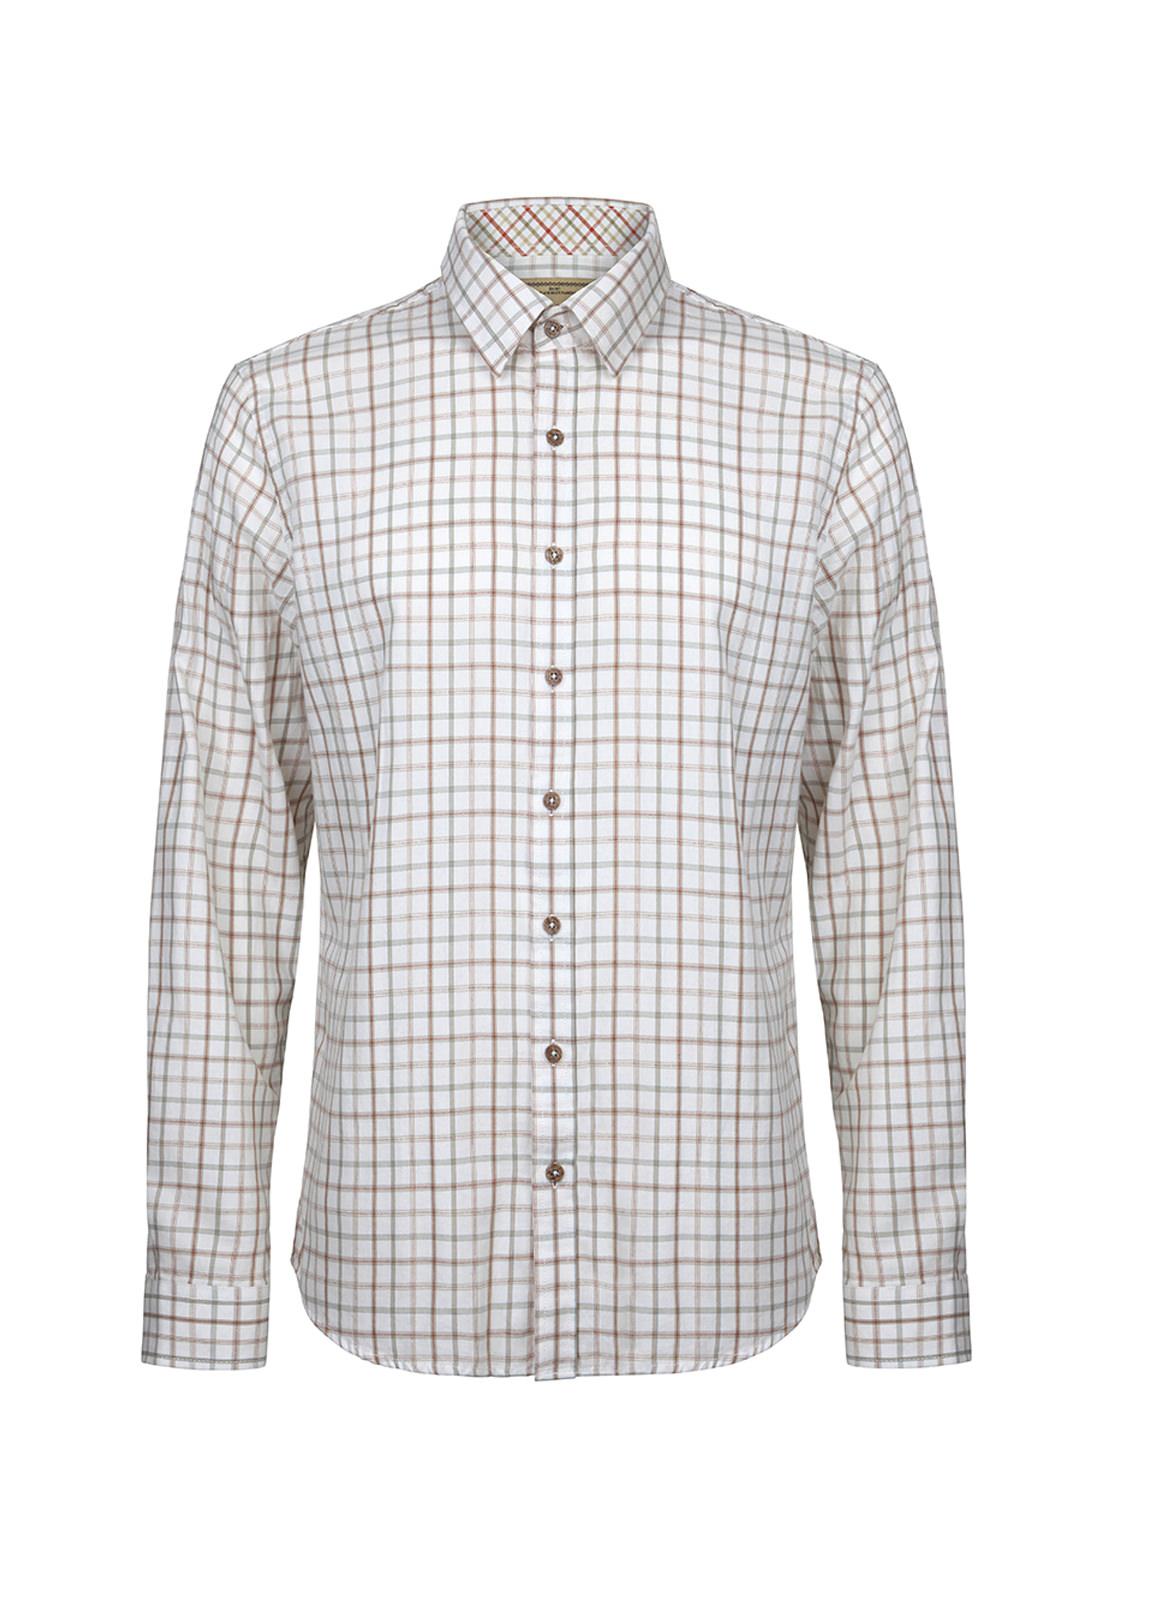 Dubarry_ Roundwood Men's Tattersall Check Shirt - S-W Multi_Image_2